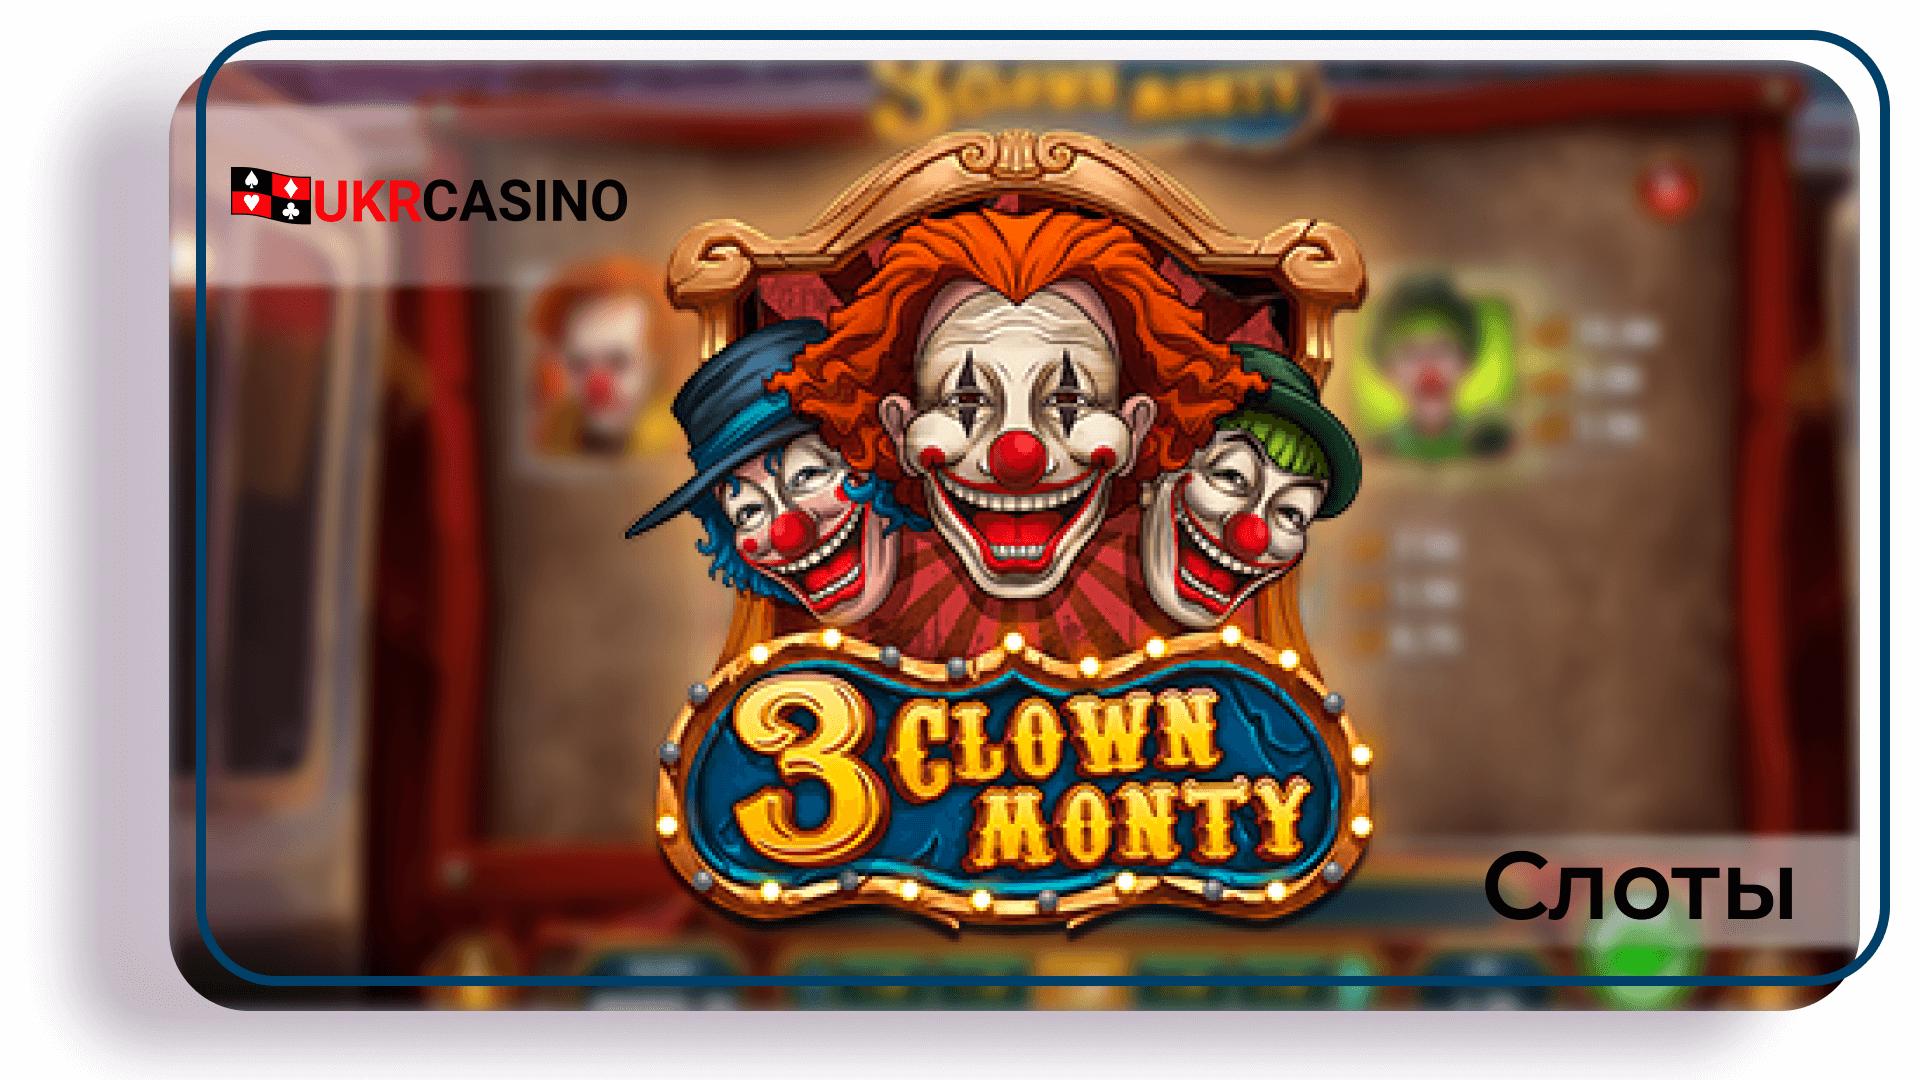 3 Clown Monty - Play'n'Go